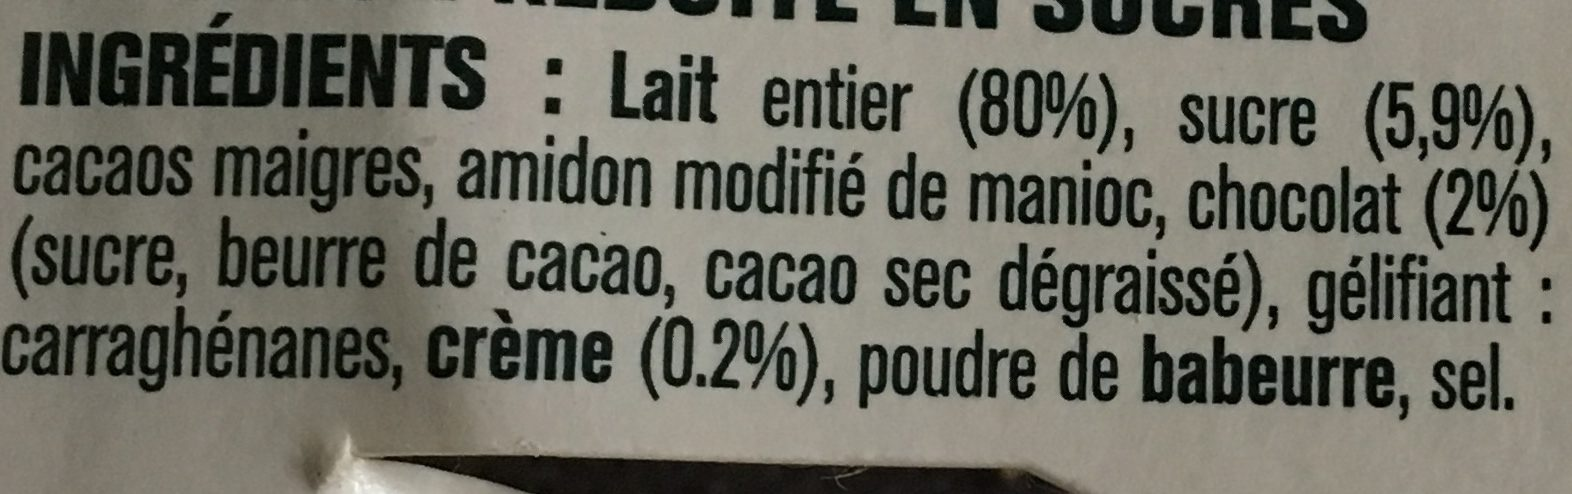 Detox -30% crème dessert chocolat - Ingredients